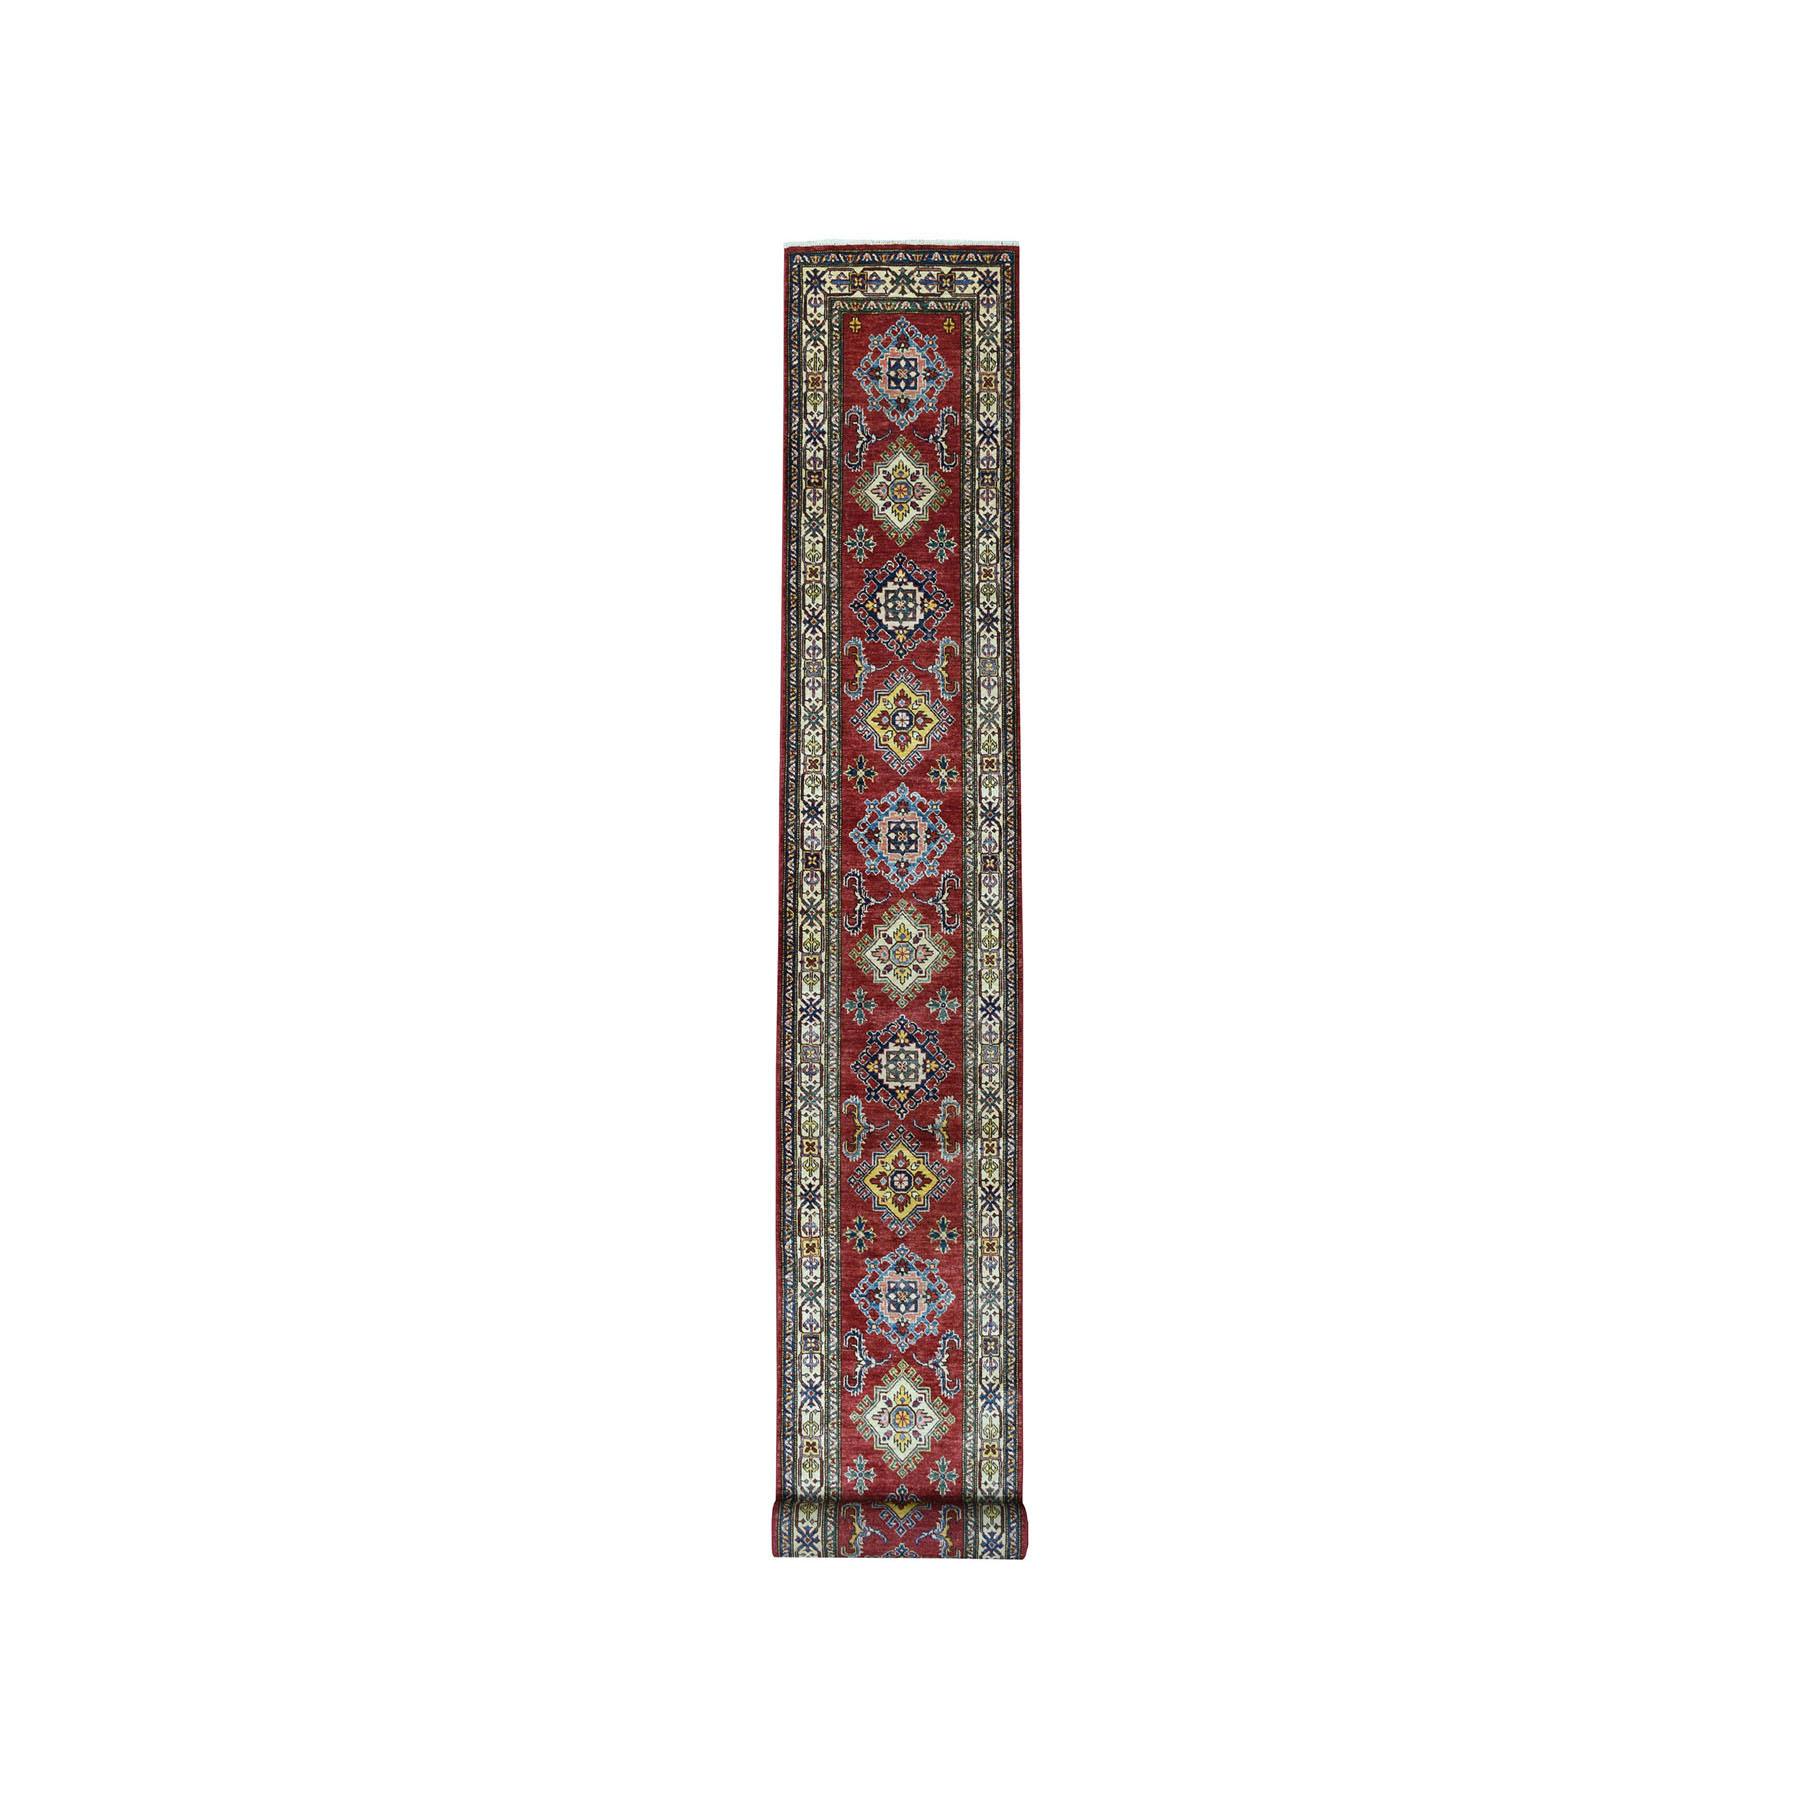 "2'5""X20'3"" Red Super Kazak Geometric Design Xl Runner Pure Wool Hand-Knotted Oriental Rug moae08a8"